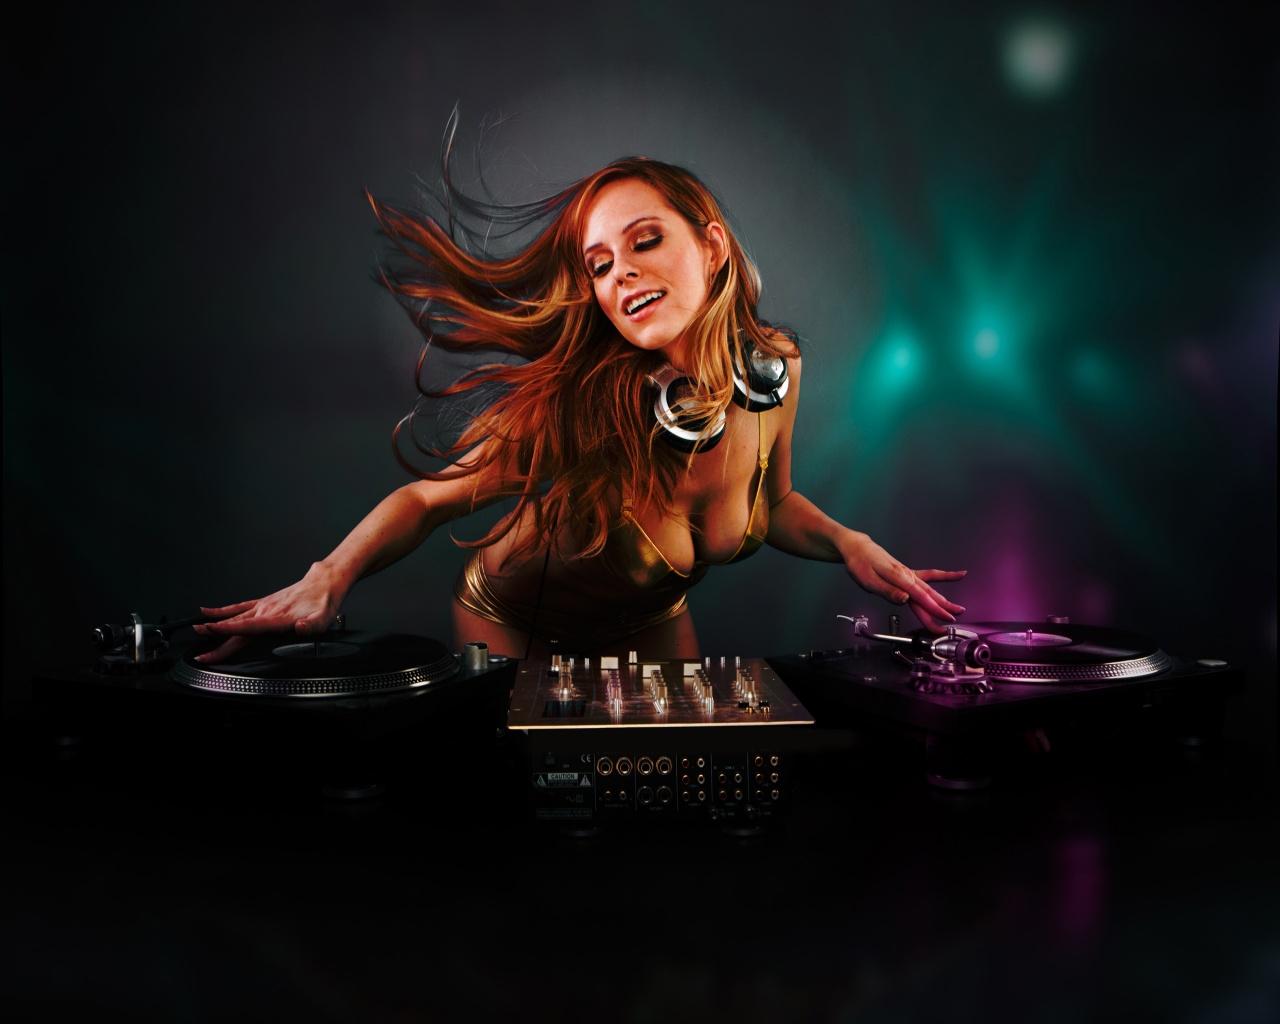 Download DJ Girl Wallpaper in 1280x1024 Resolution 1280x1024